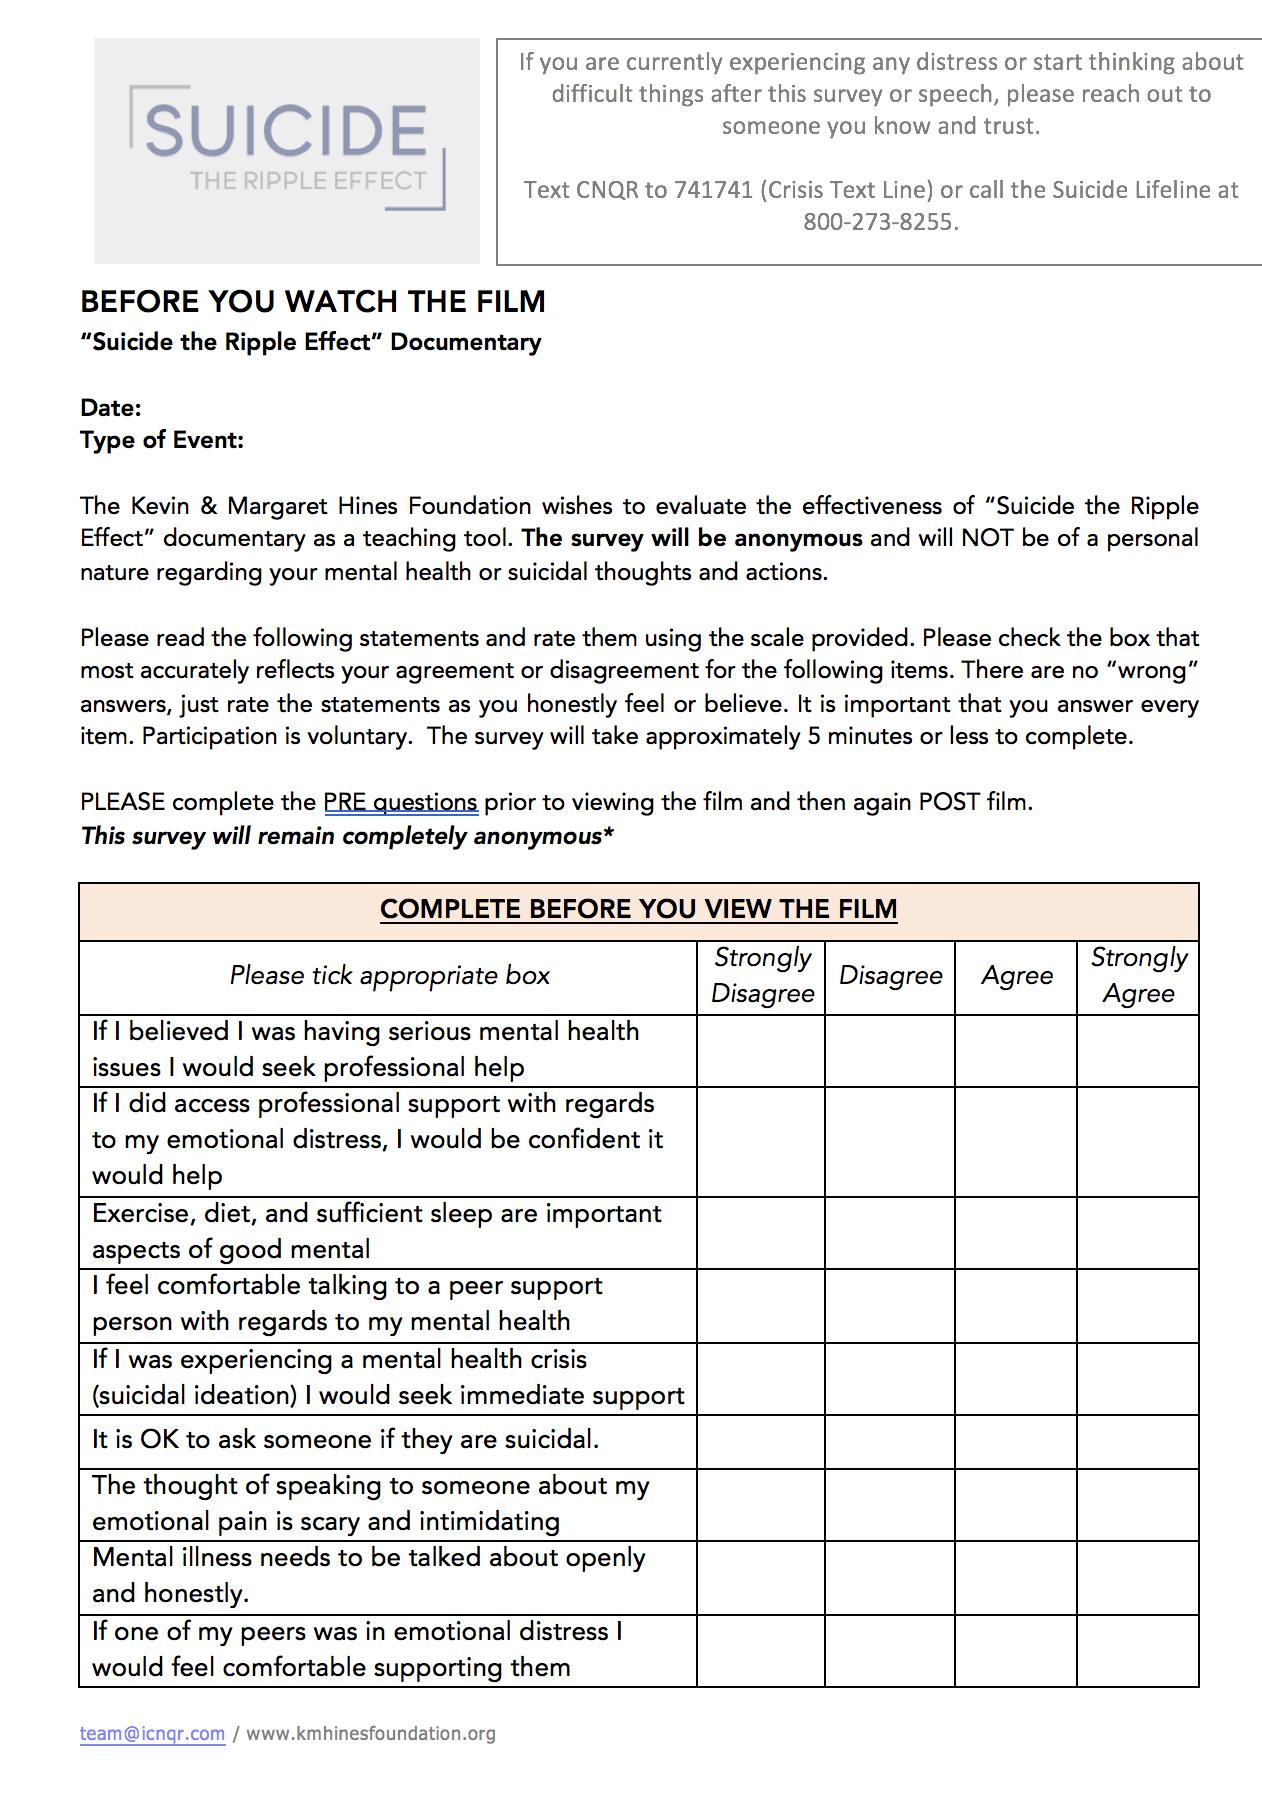 Pre & Post Surveys - Download Here